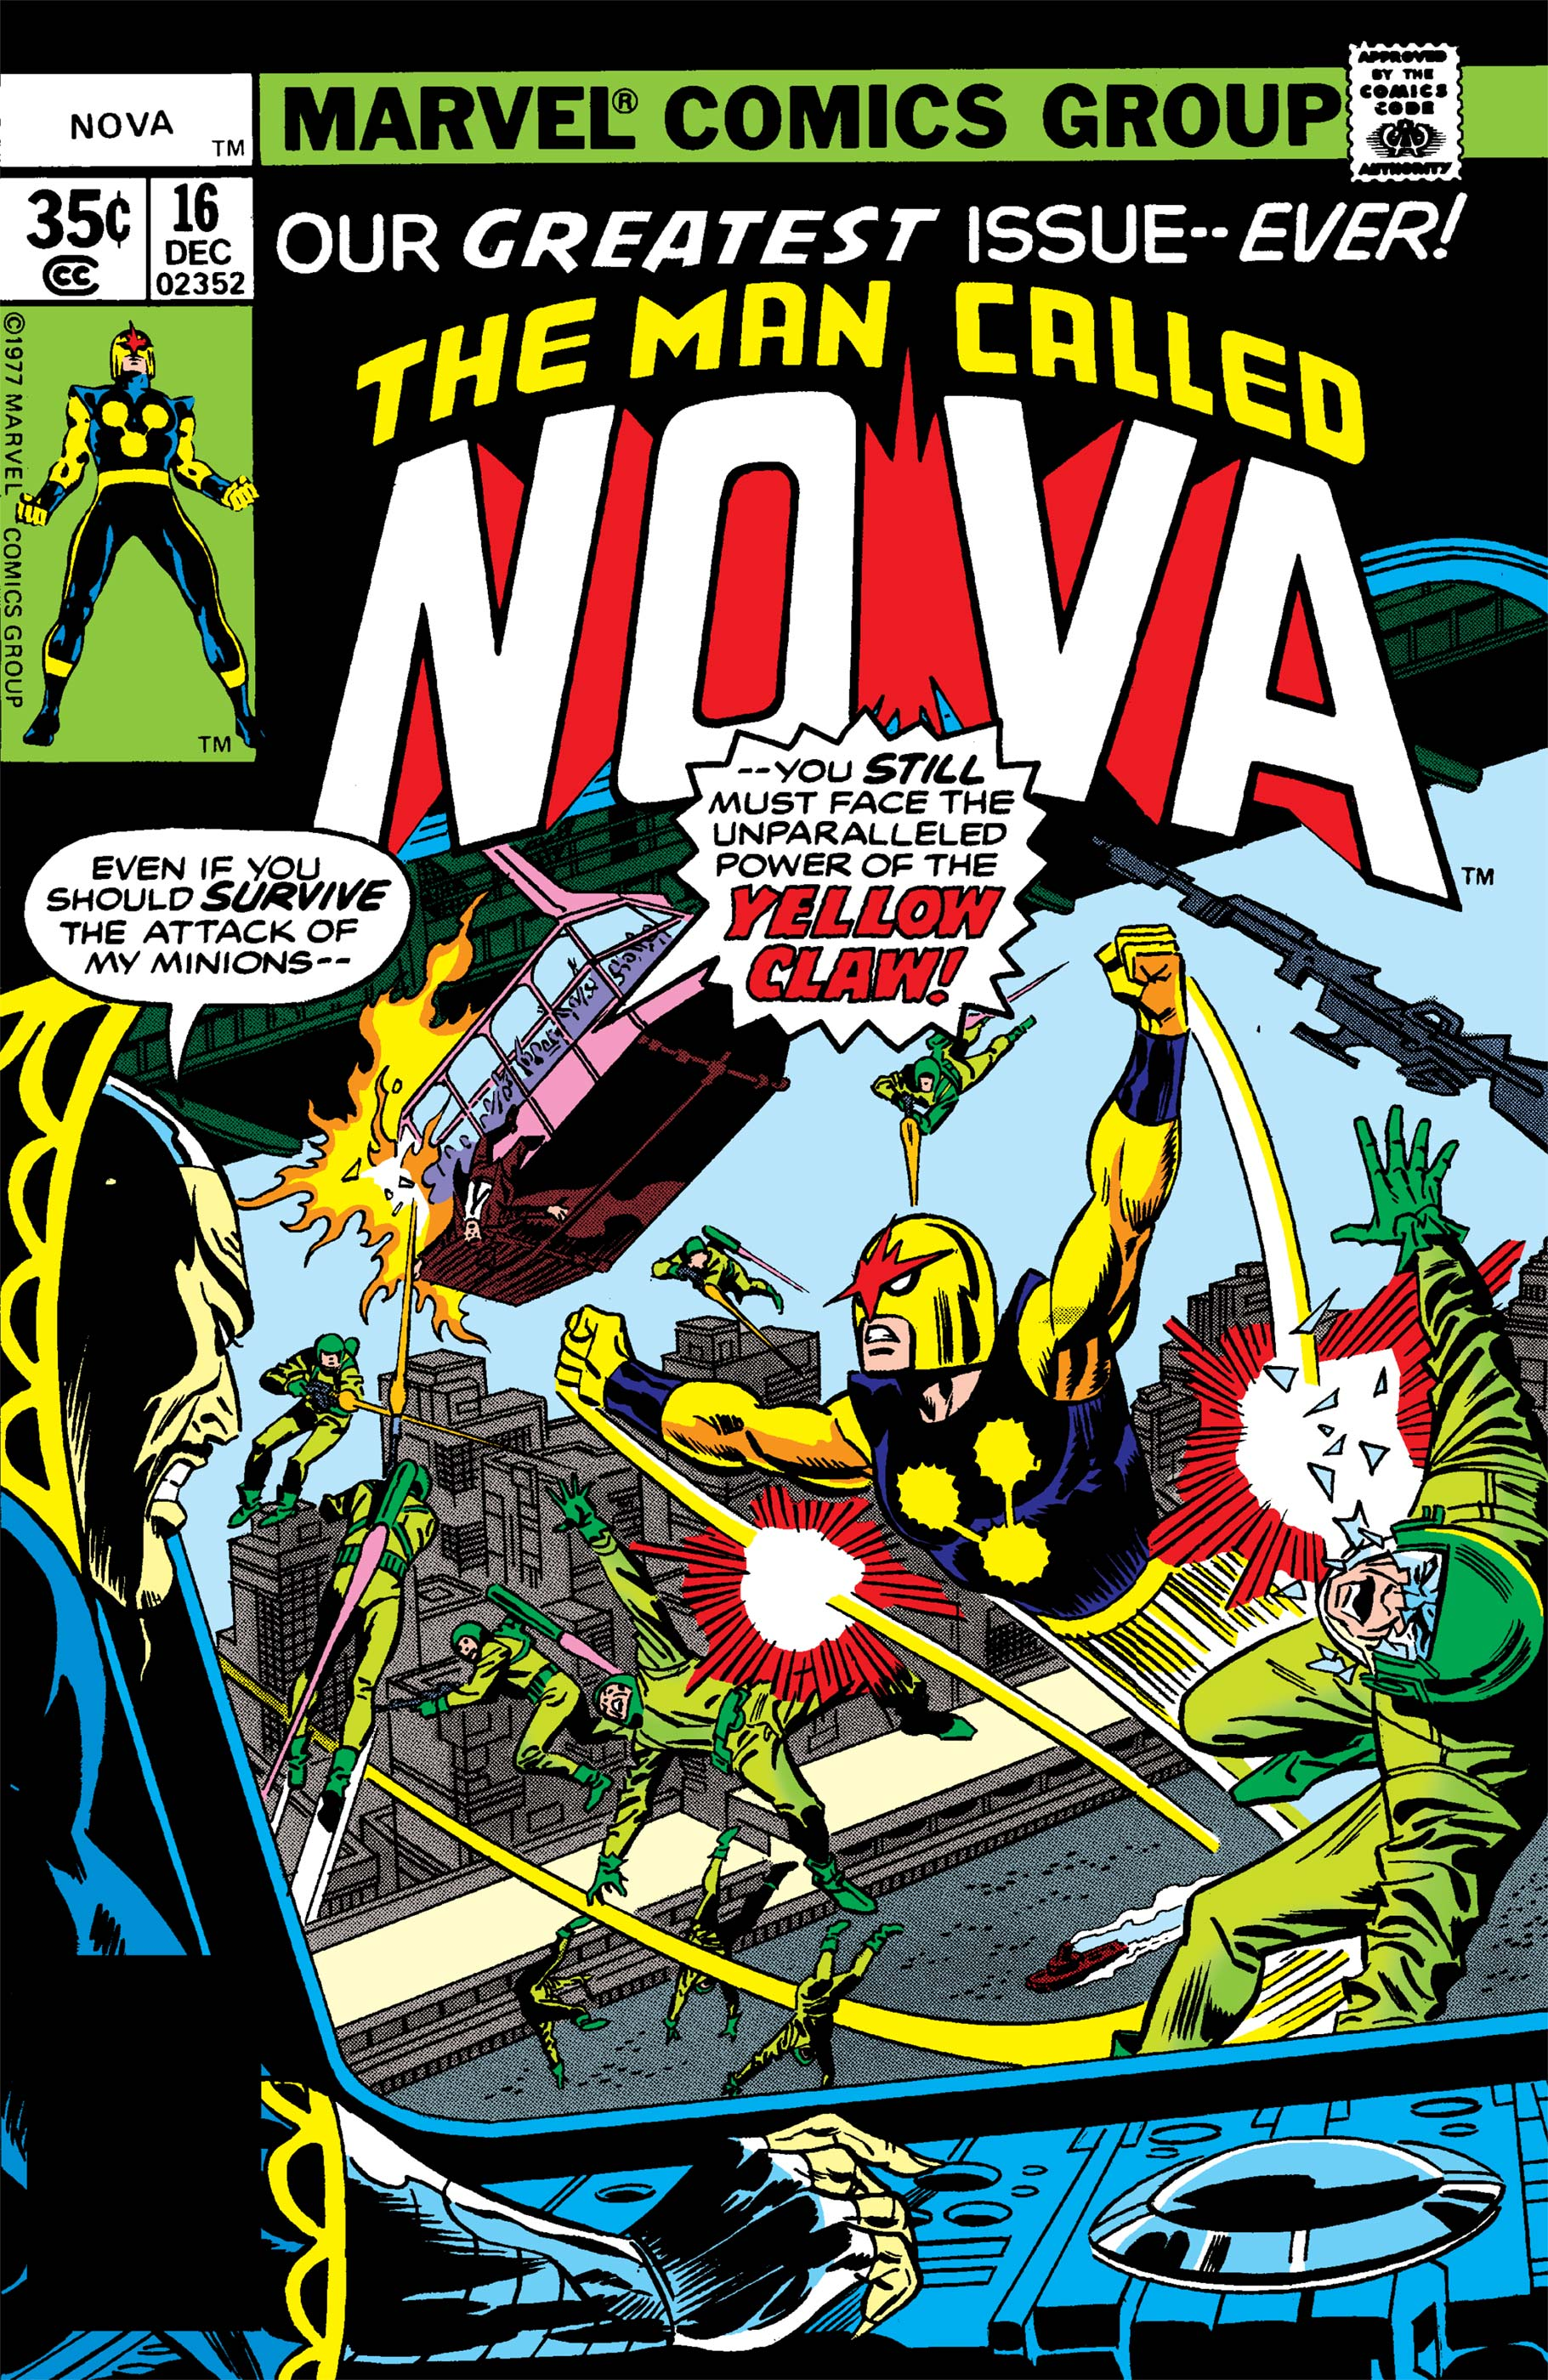 Nova (1976) #16